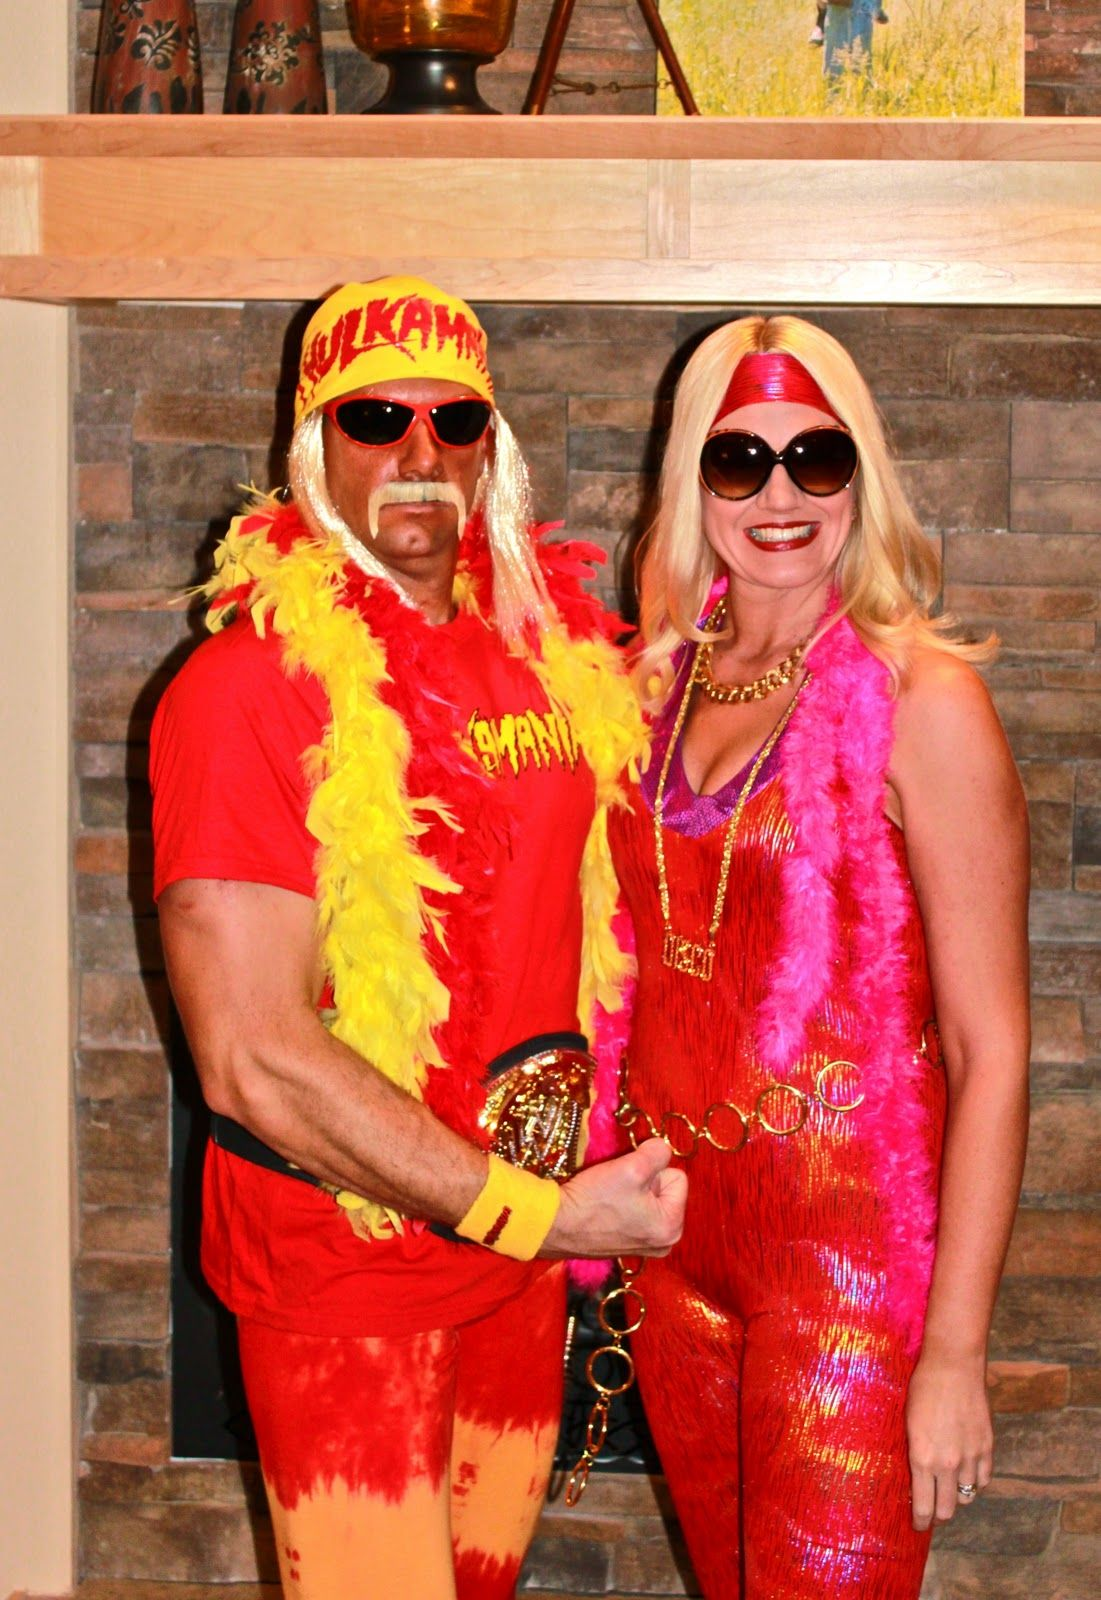 hulk hogan and wife costume